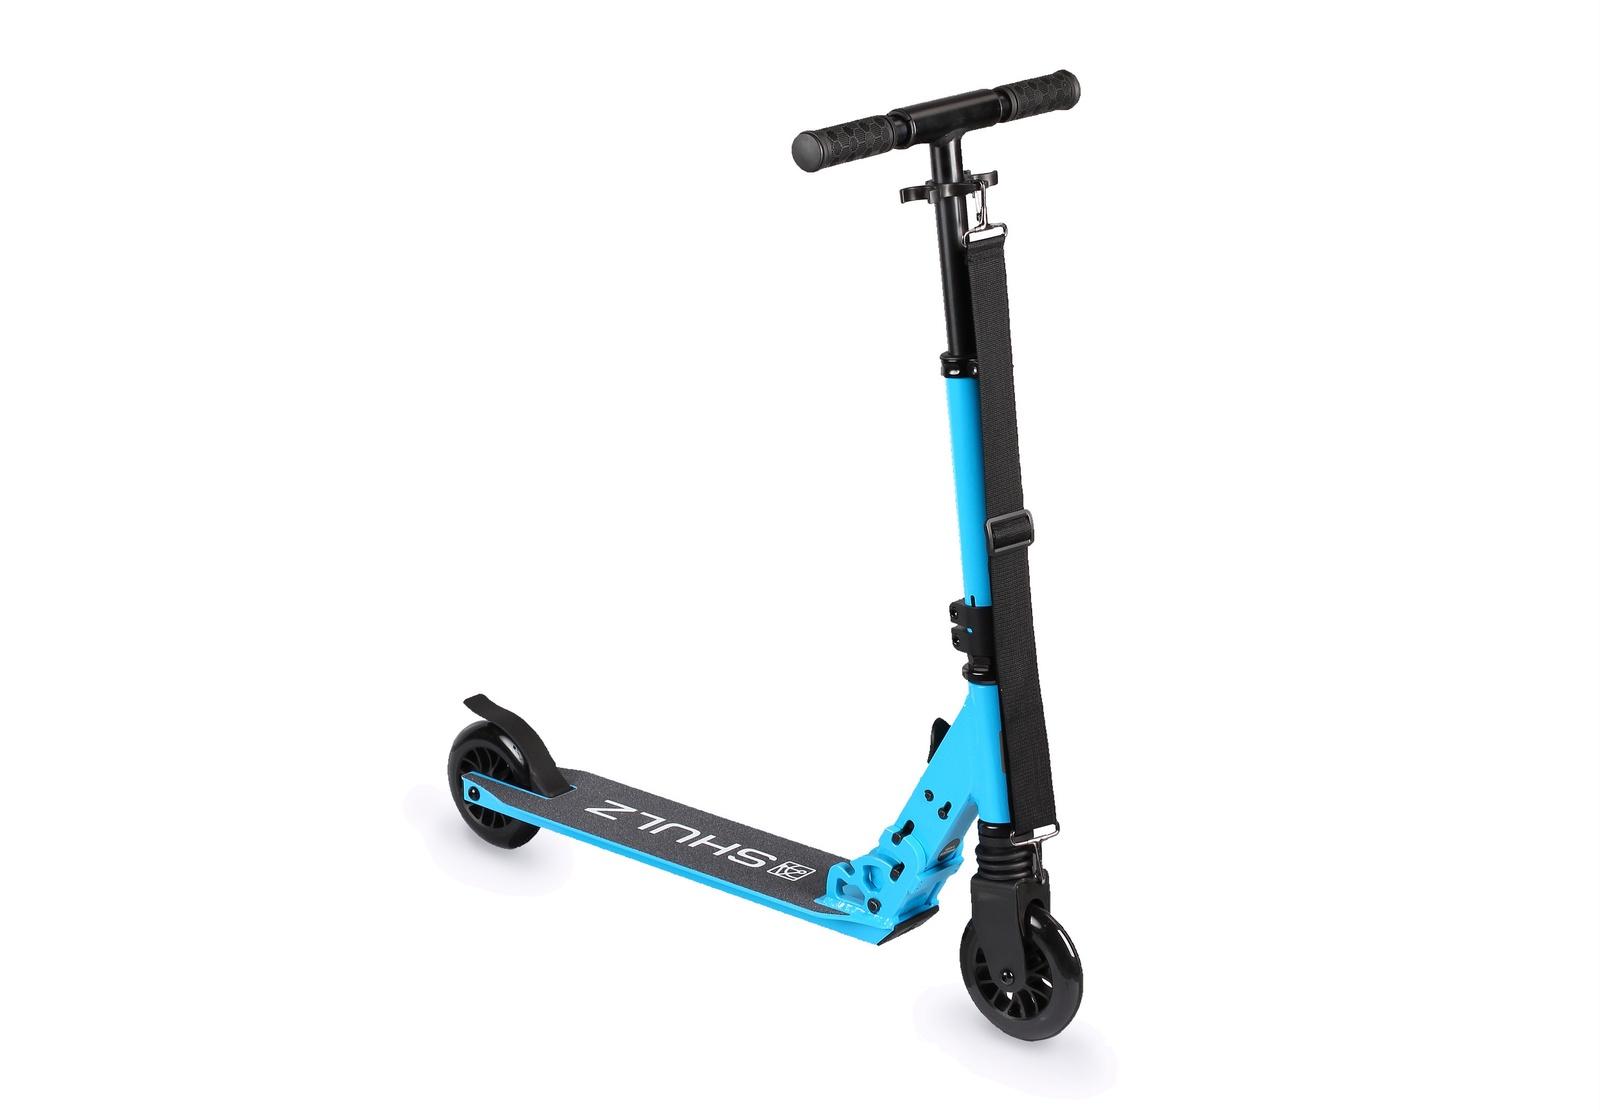 Самокат Shulz 120 2000008306669, голубой, 3,4 кг цена